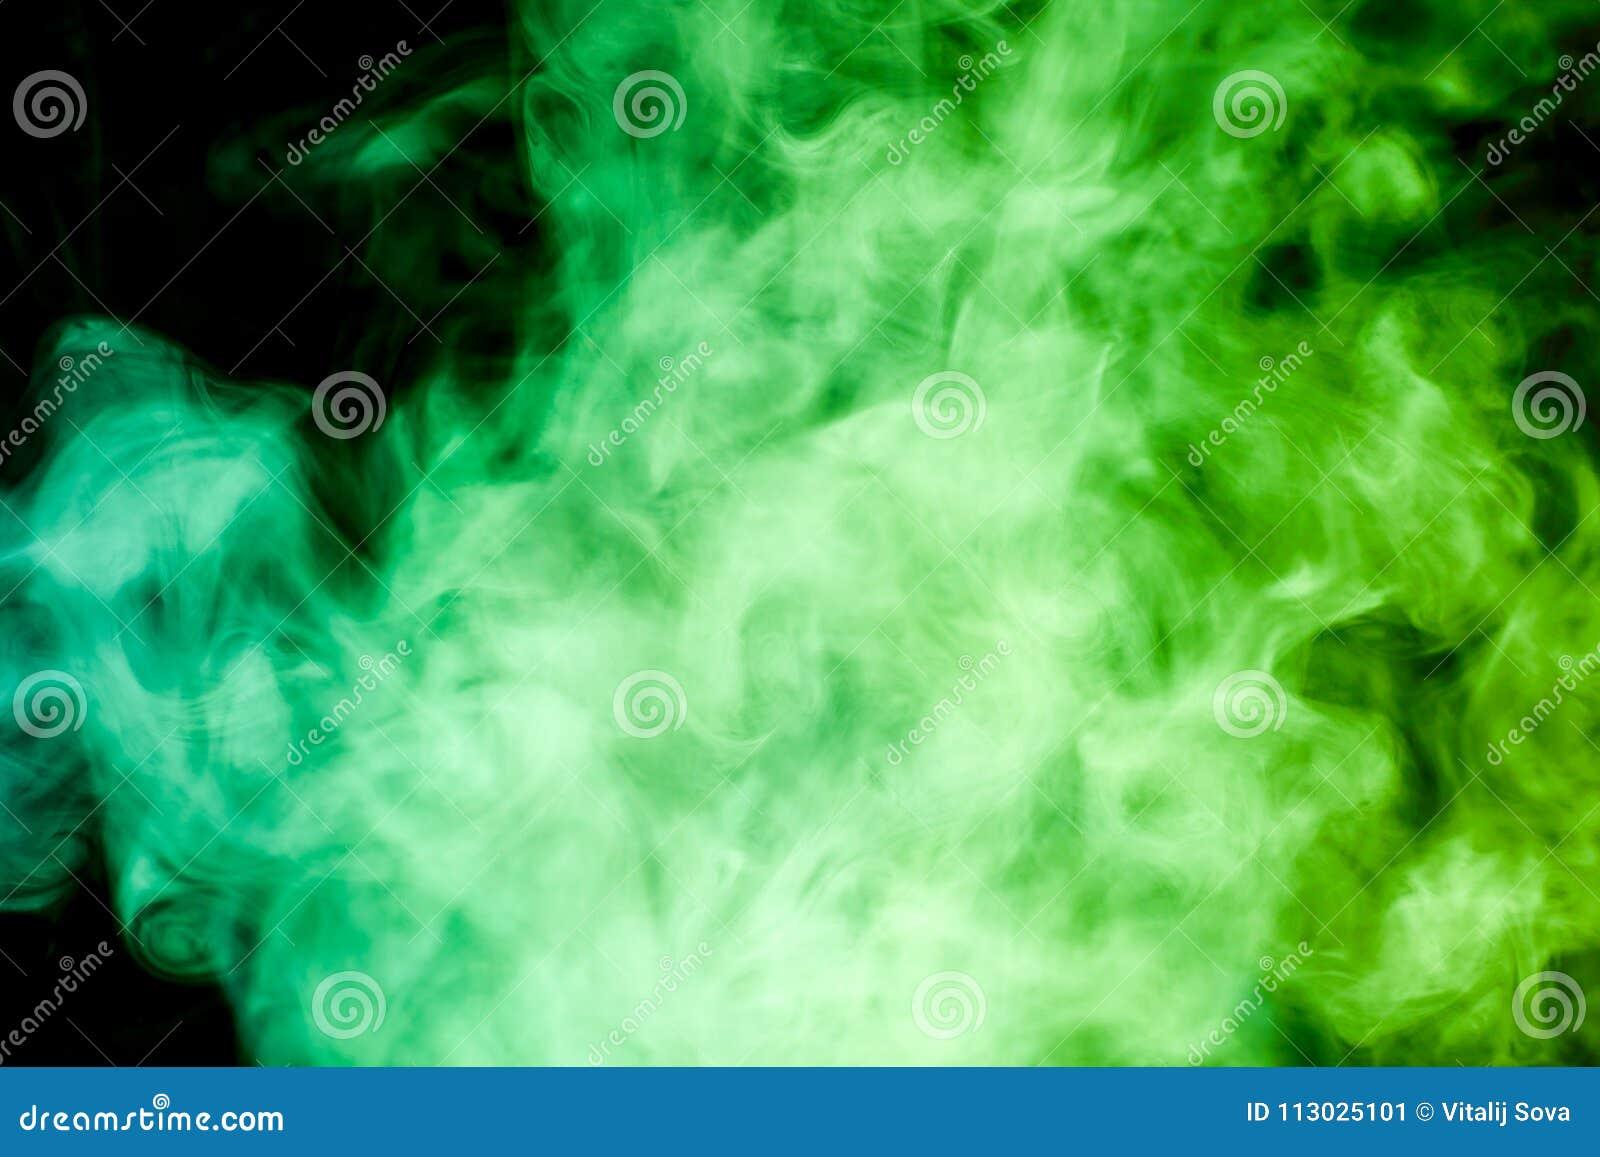 Fondo del vape del humo